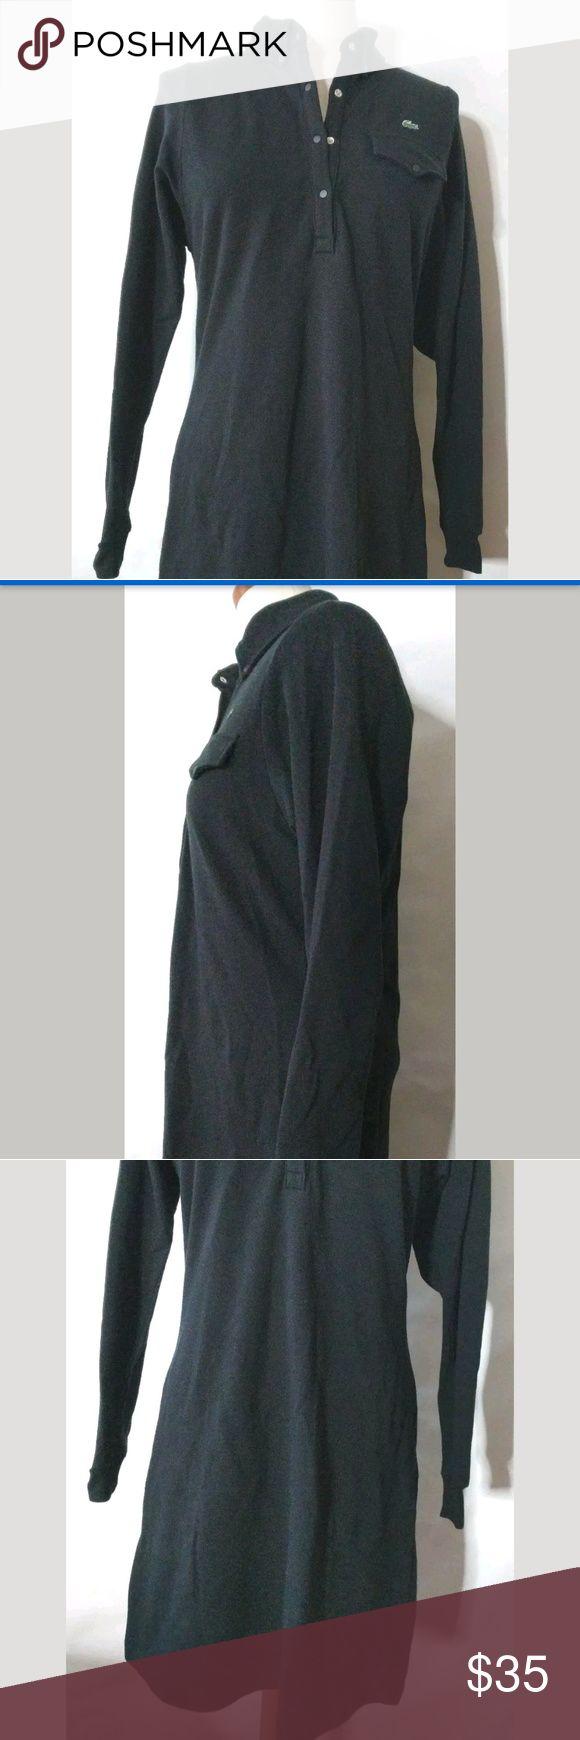 I just added this listing on Poshmark: Lacoste #knit e #Knit #Polodress #TennisDress Size 38 Med. #shopmycloset #poshmark #fashion #shopping #style #forsale #Lacoste #Dresses & Skirts #longsleeve